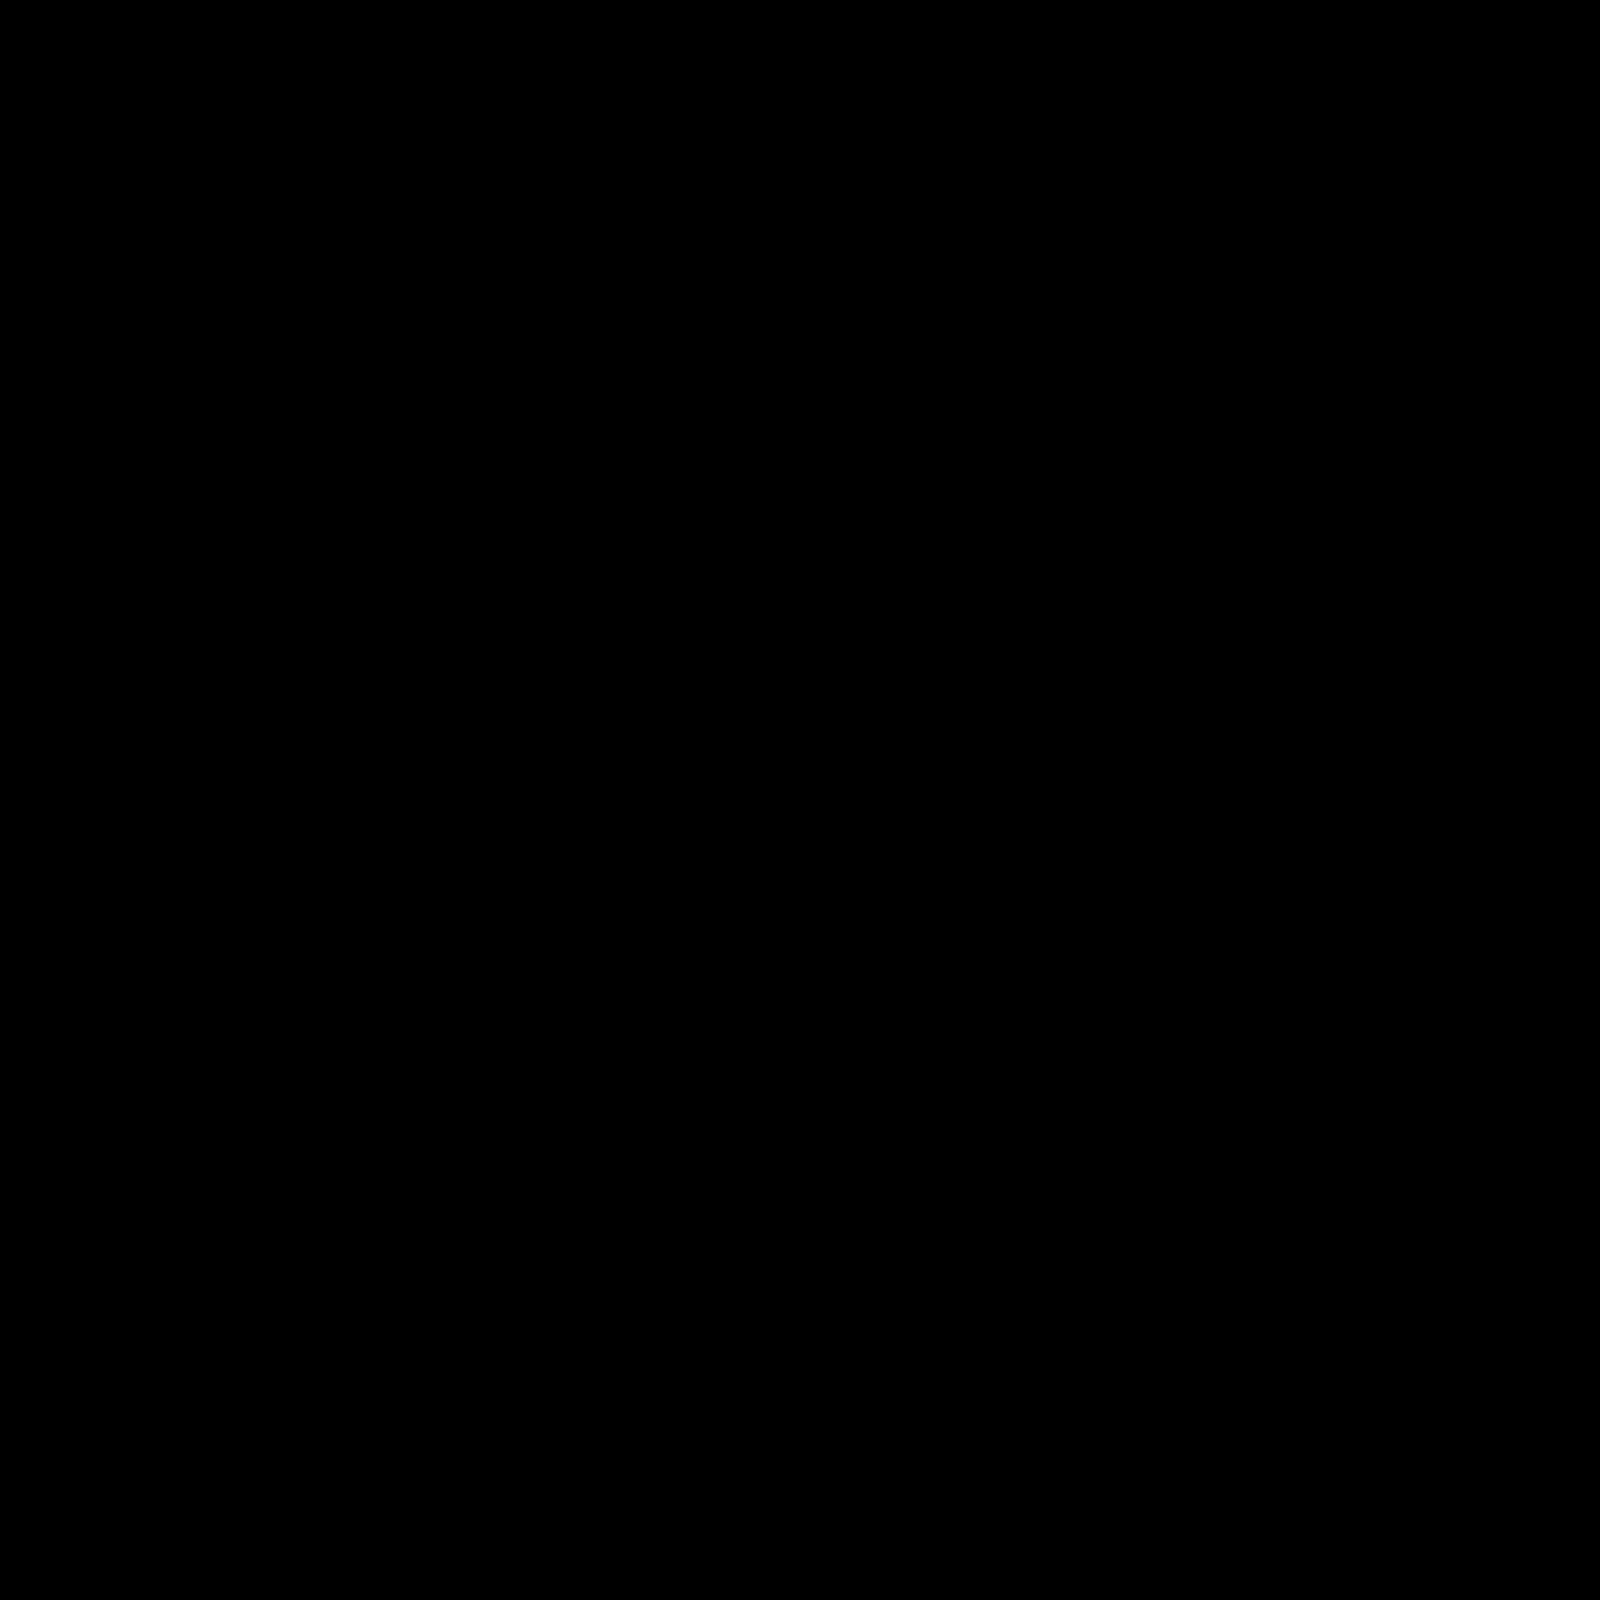 Radio 2 Filled icon